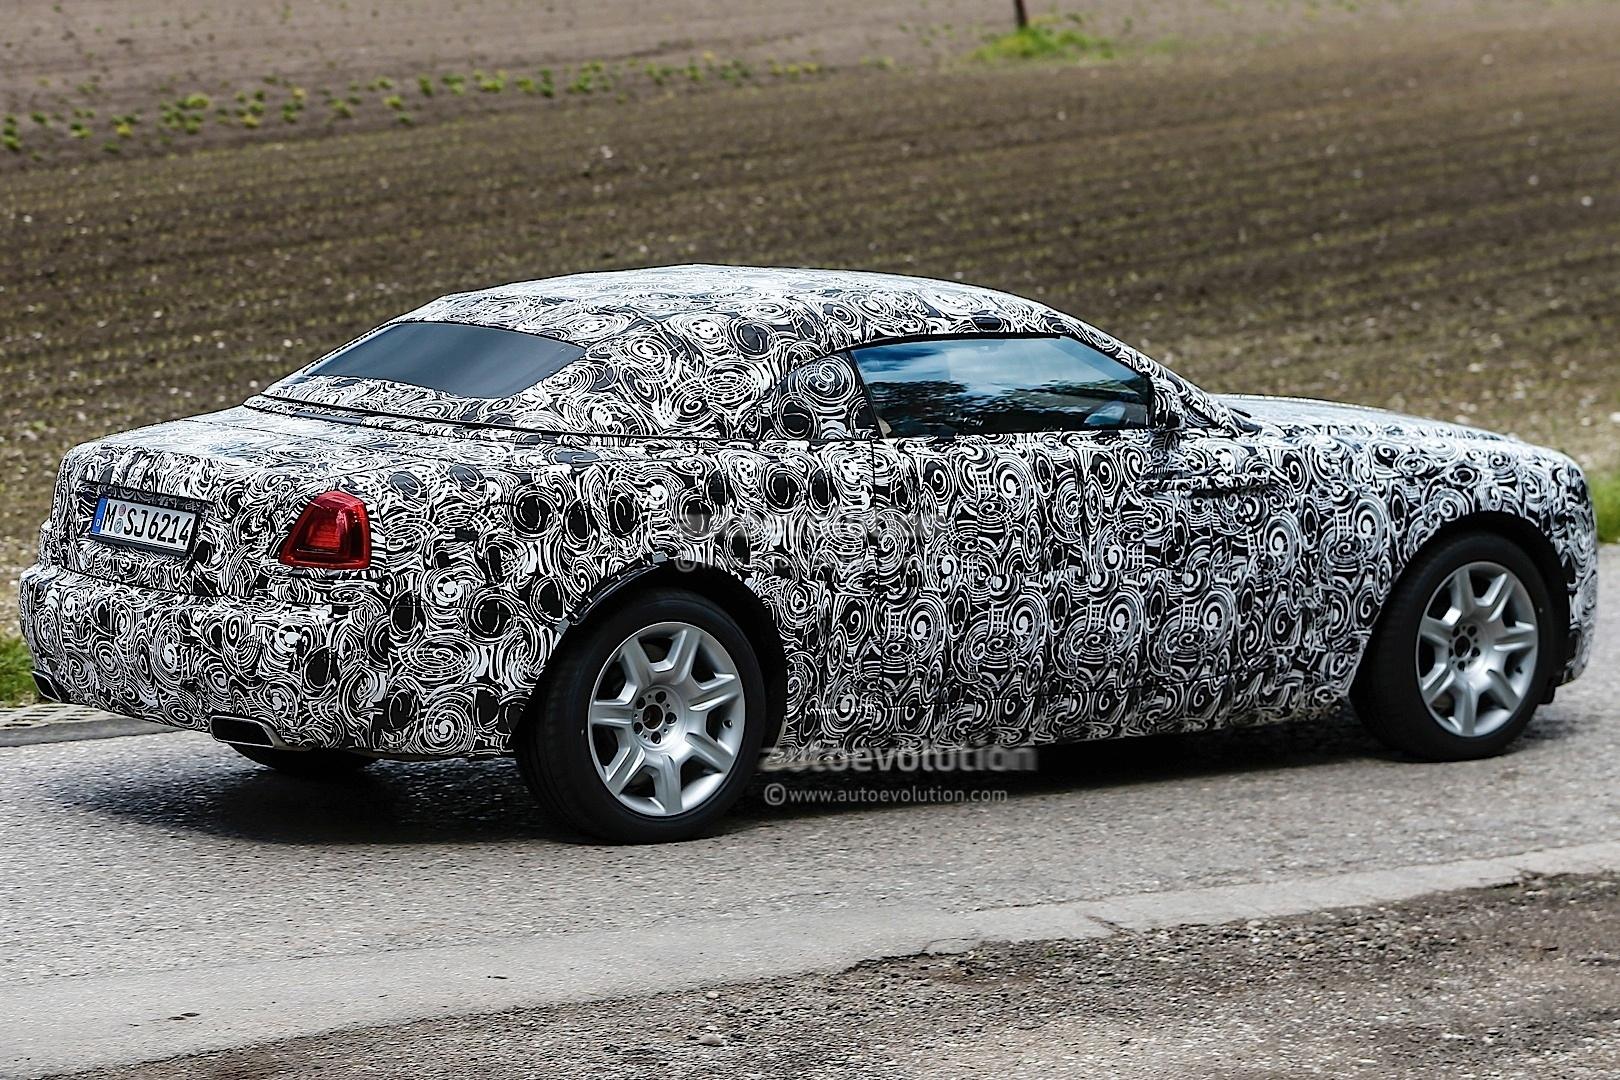 Phantom Car Wallpaper Rolls Royce Spied Testing Wraith Drophead Coupe